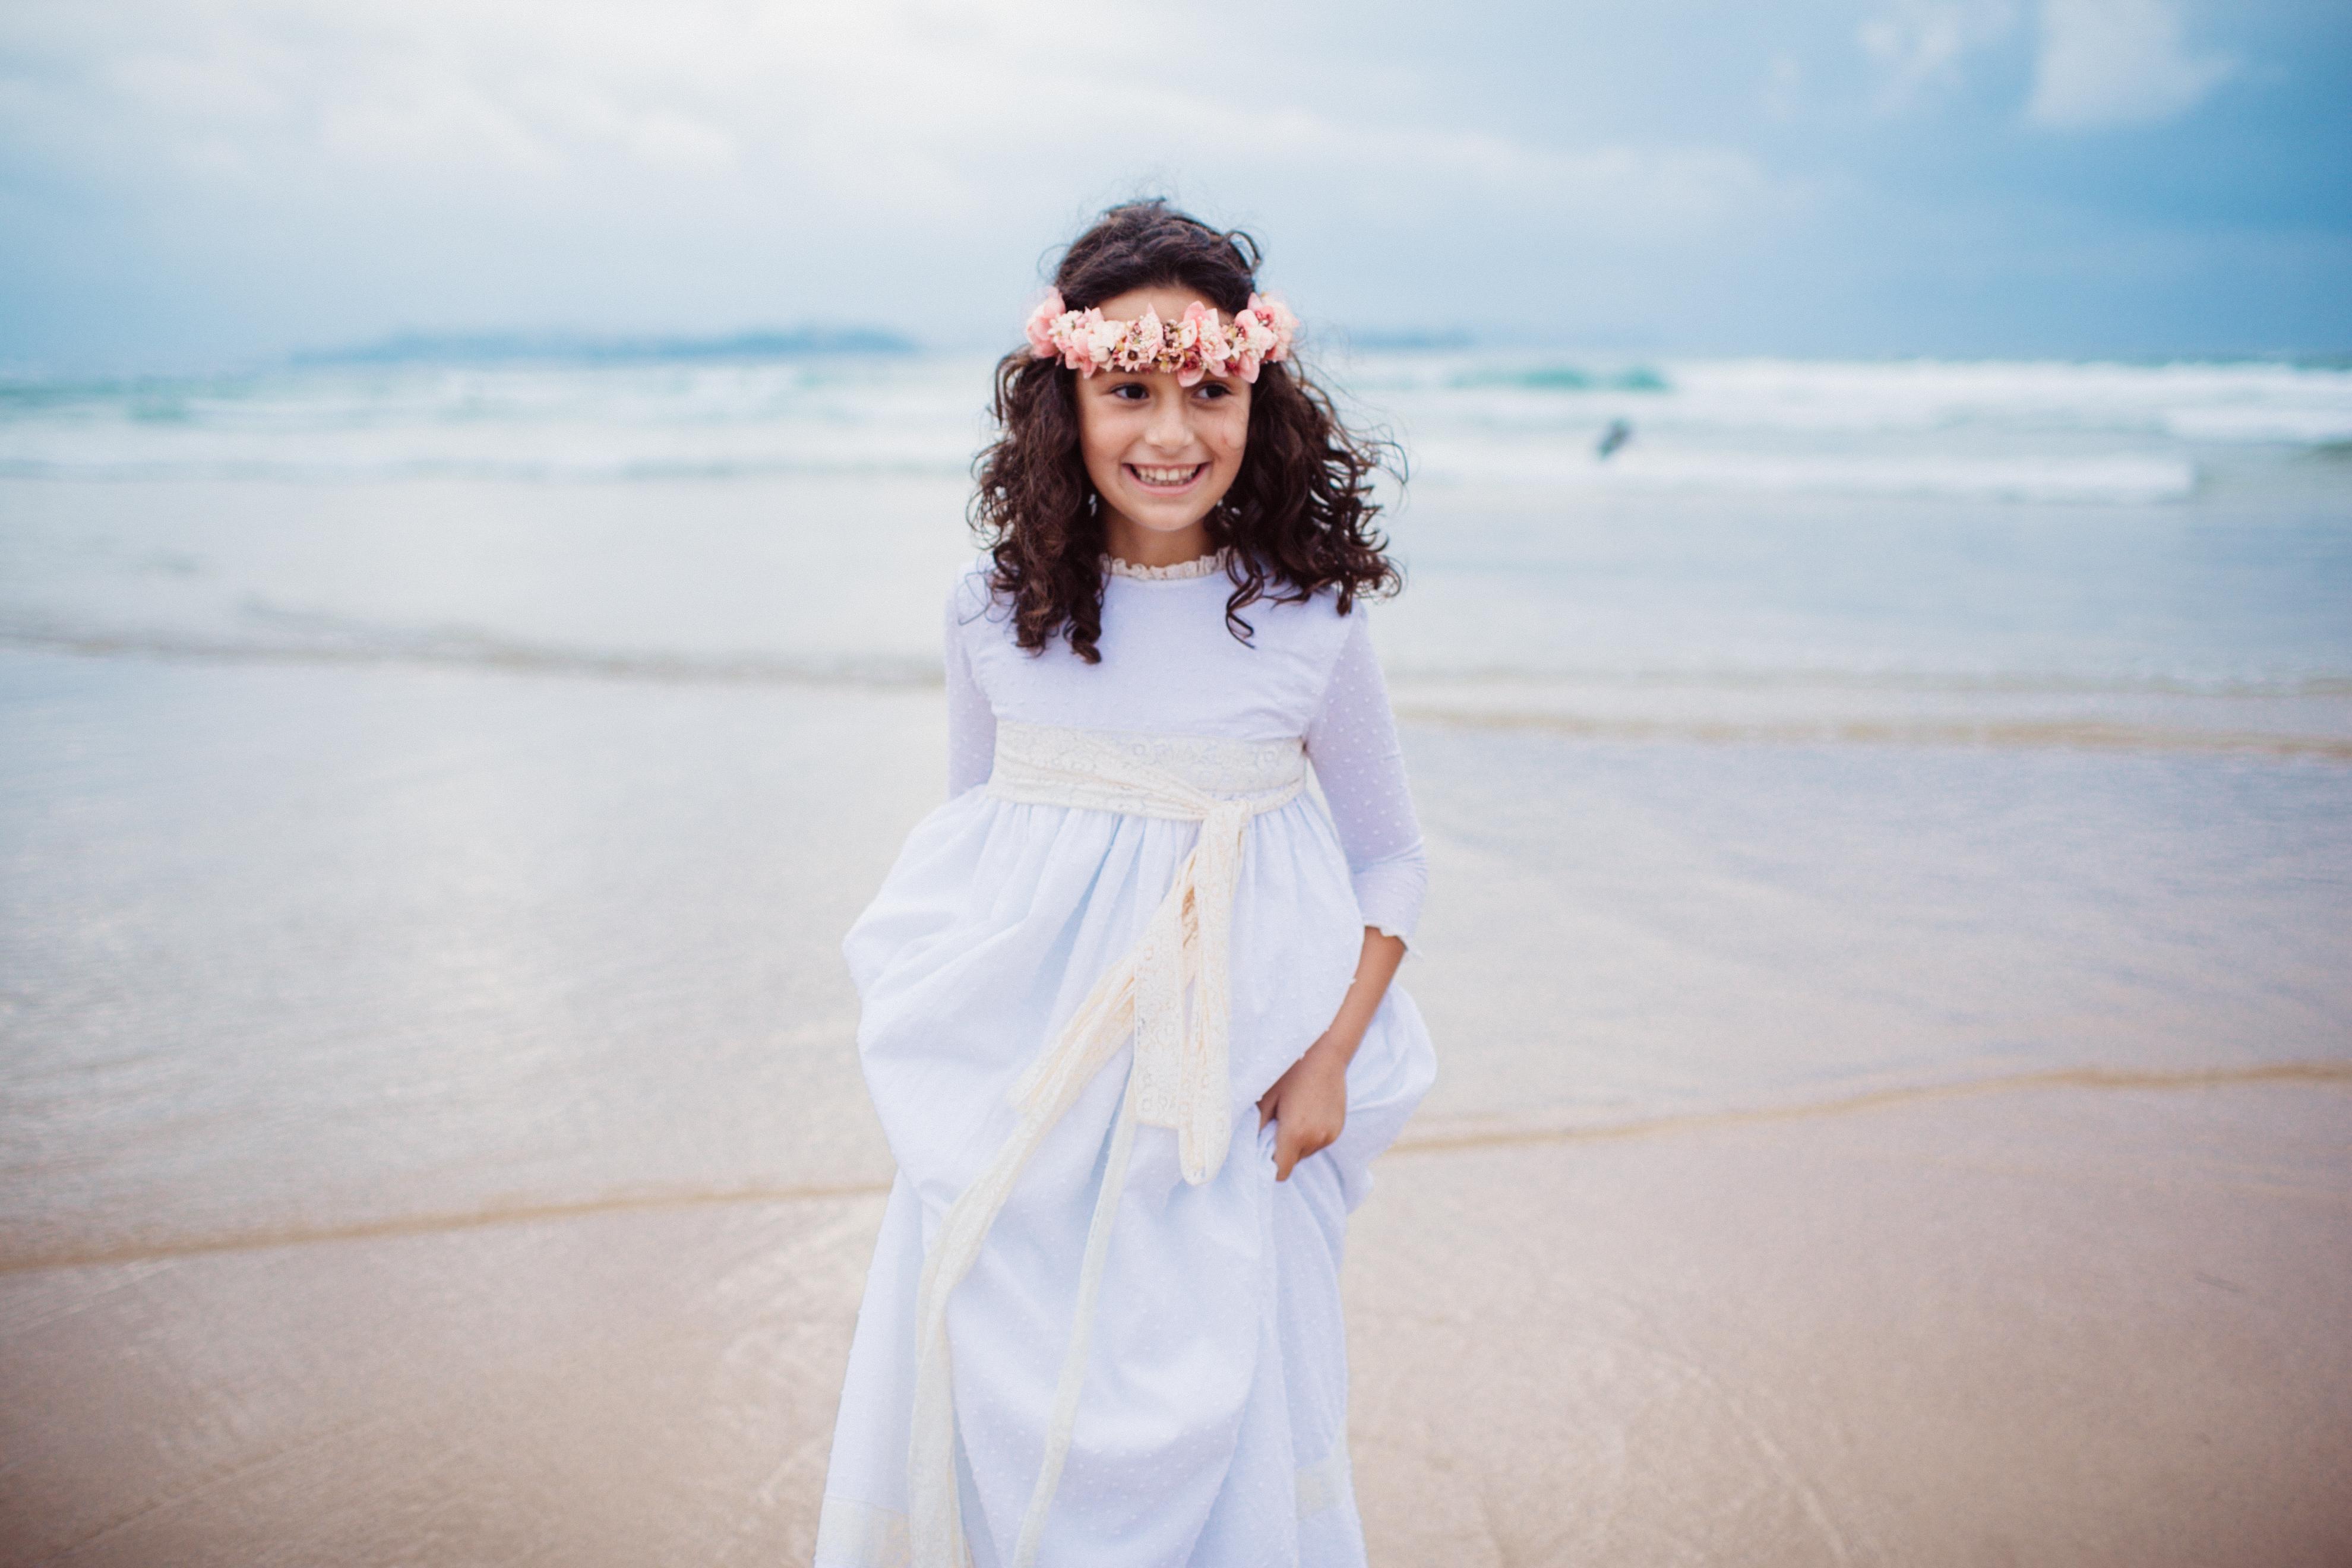 vestido-de-comunion-2017-vestido-de-comunion-a-medida-34